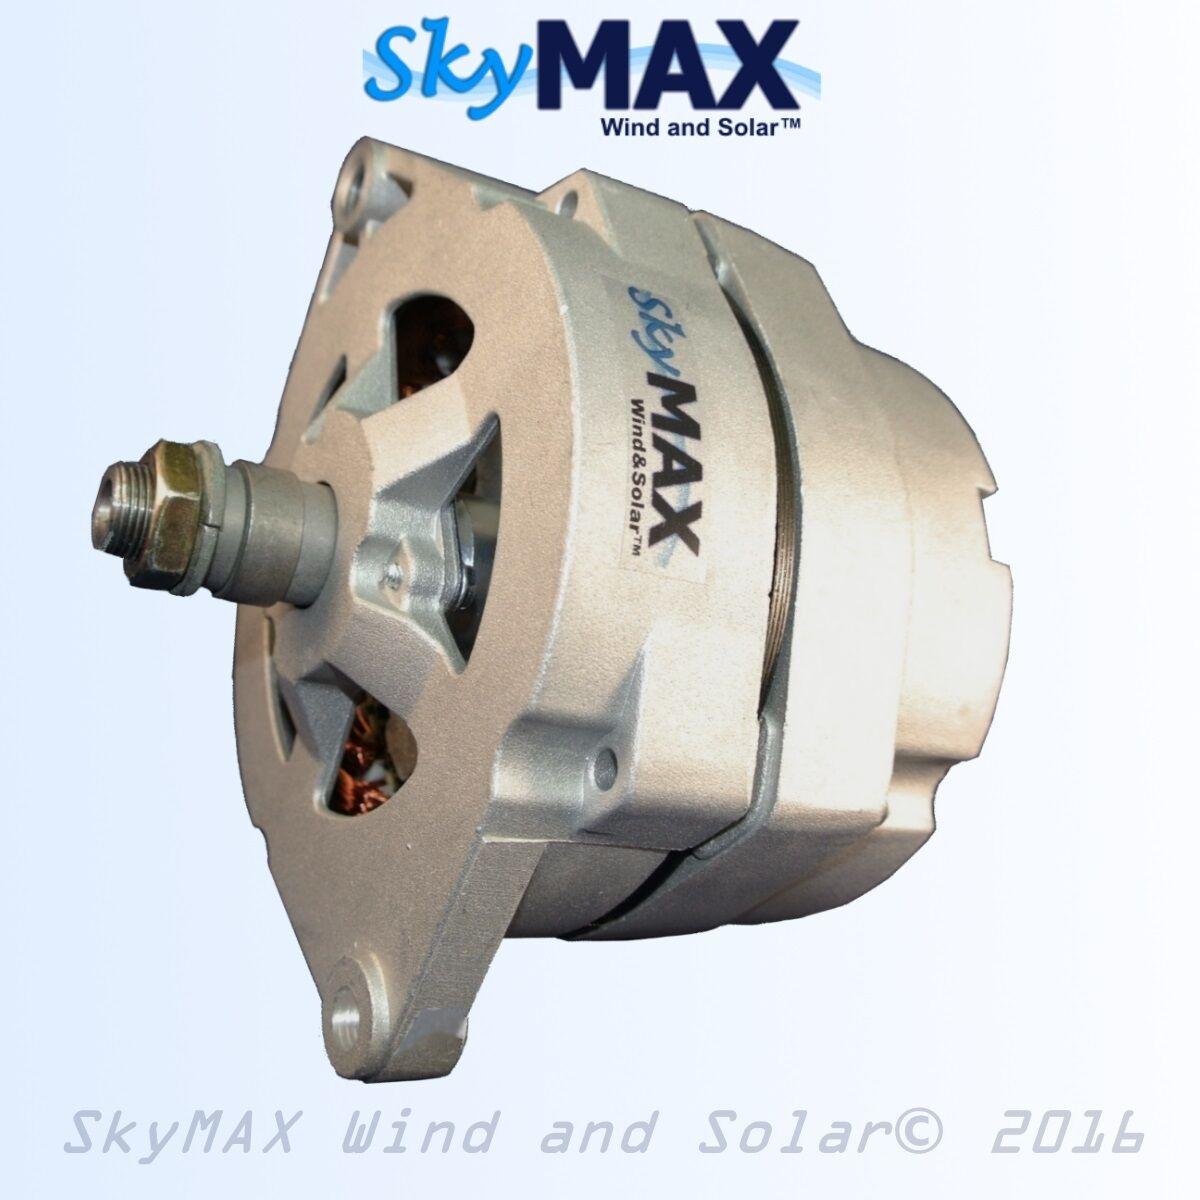 Dc permanent magnet alternator 12 volt for building a wind turbine skymax wind and solar solutioingenieria Choice Image